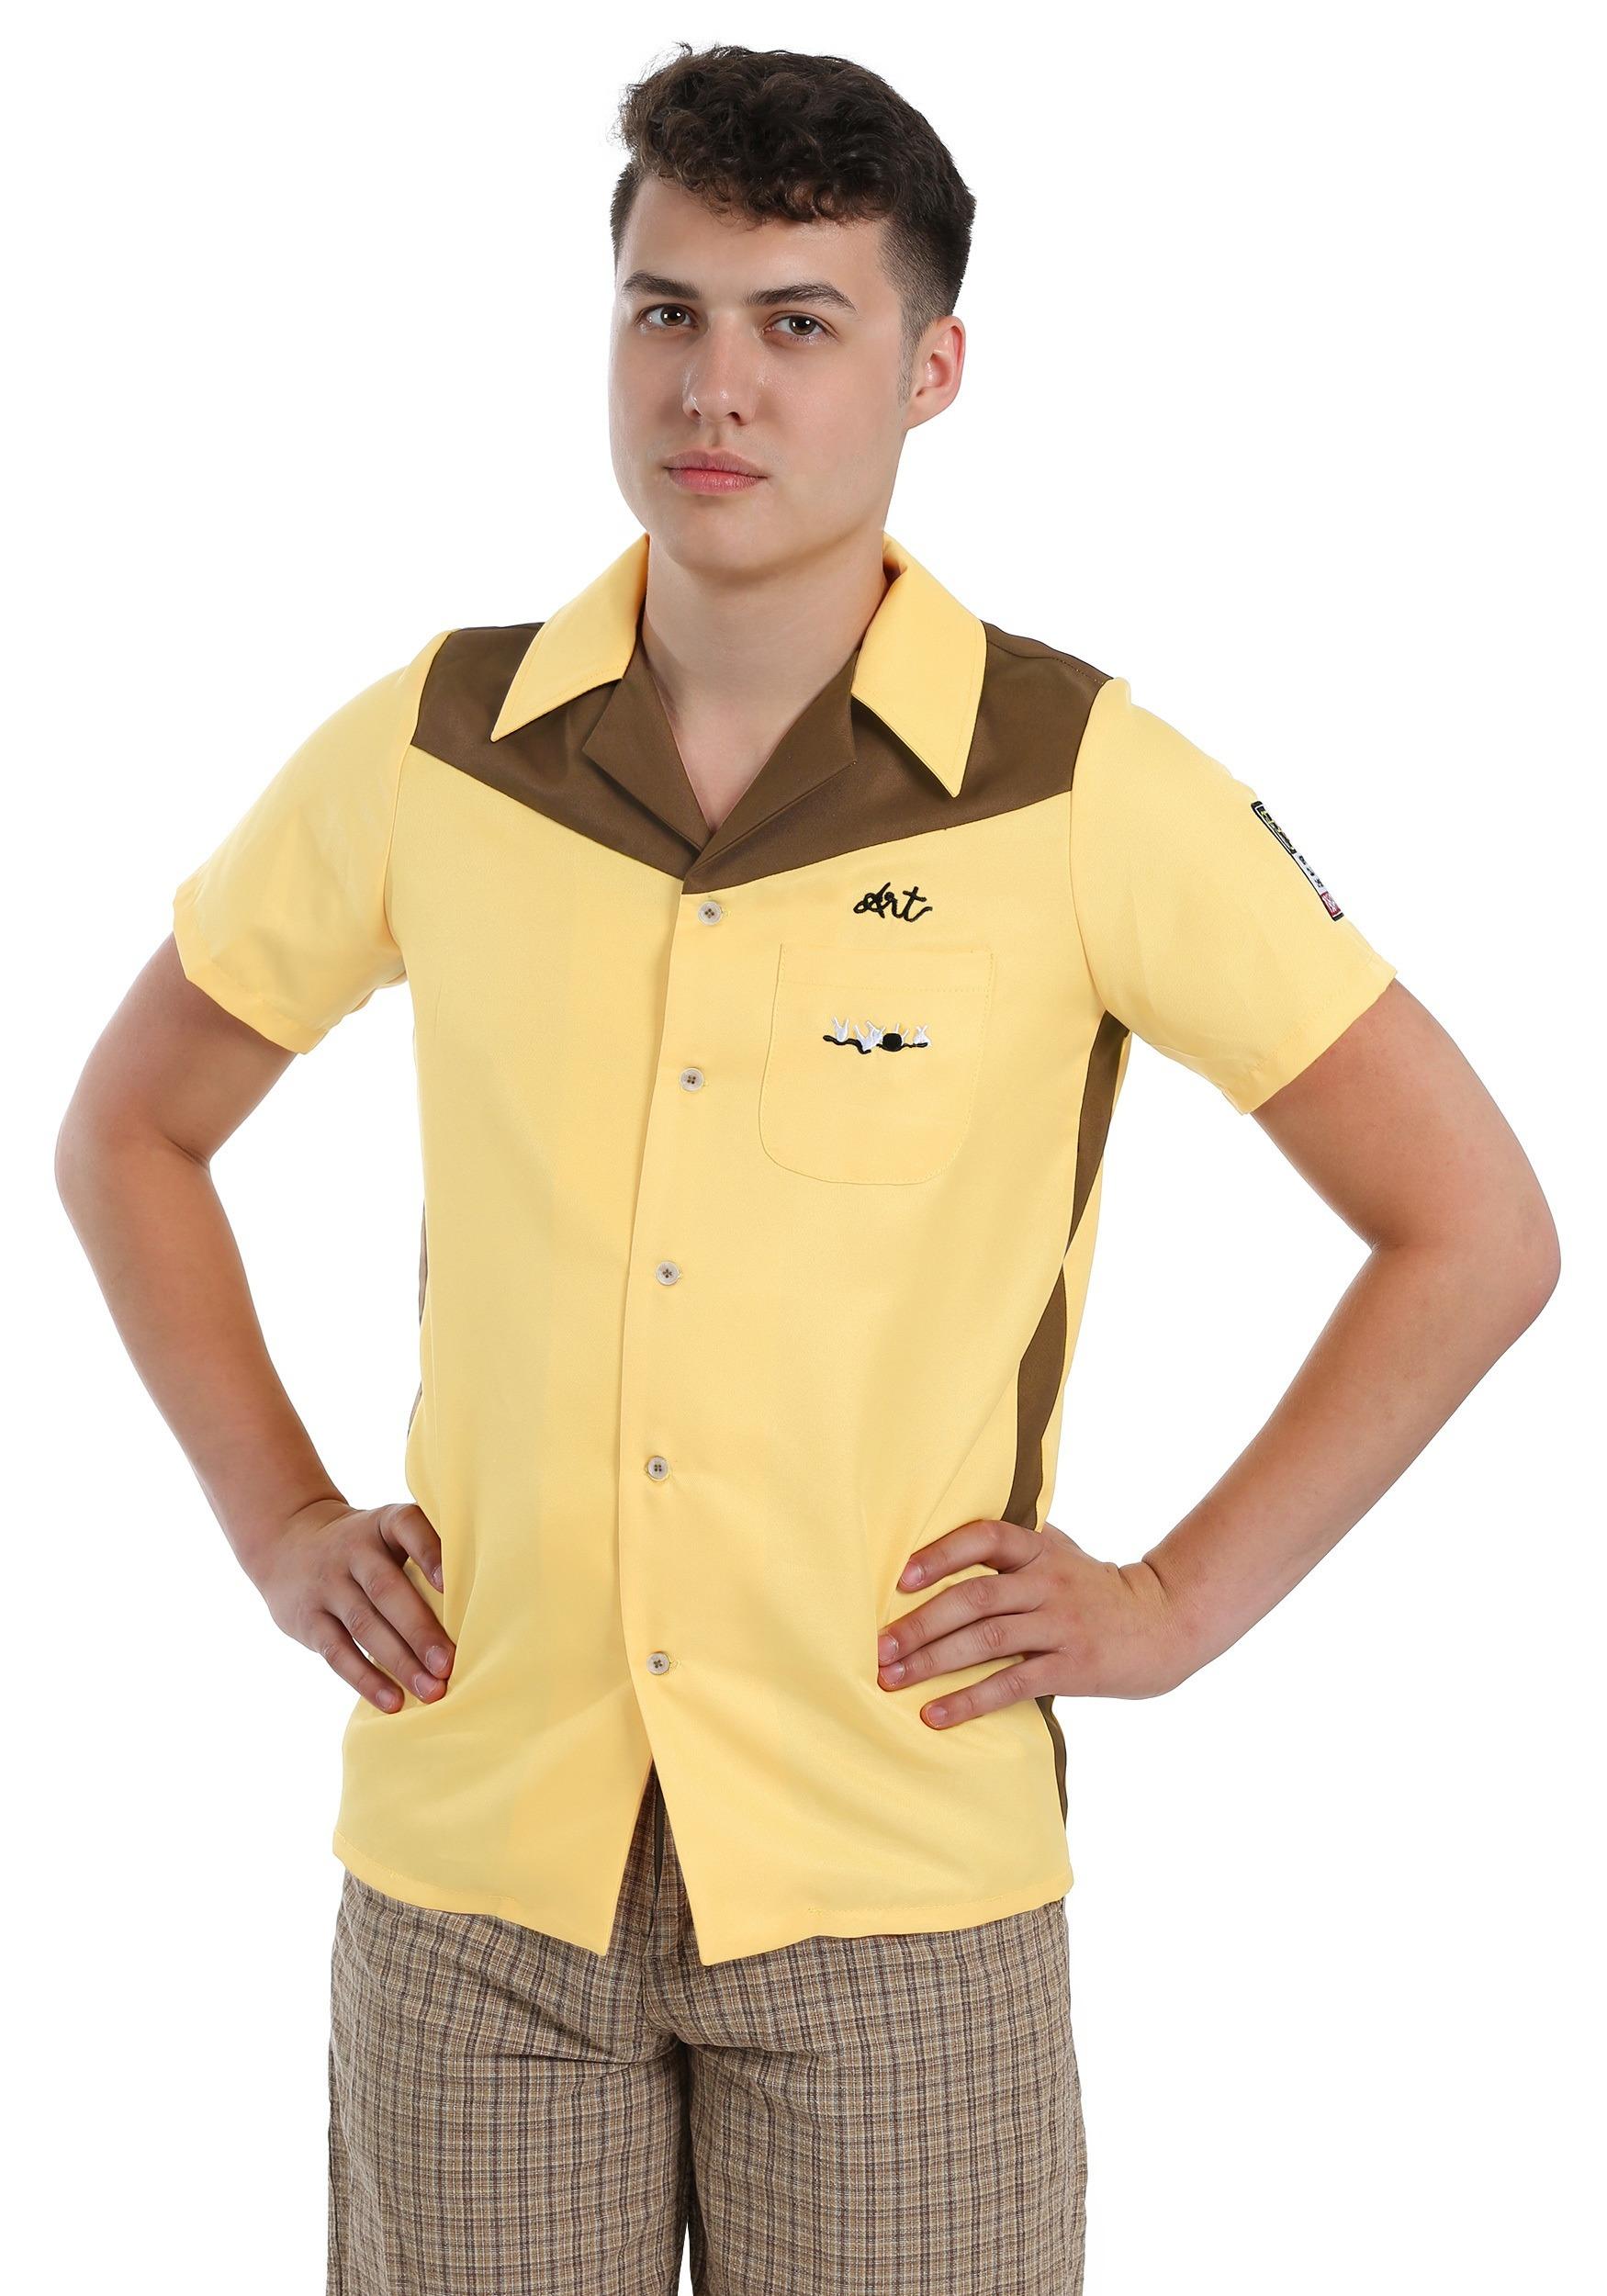 Plus Size Medina Sod Bowling Shirt Costume from Big Lebowski